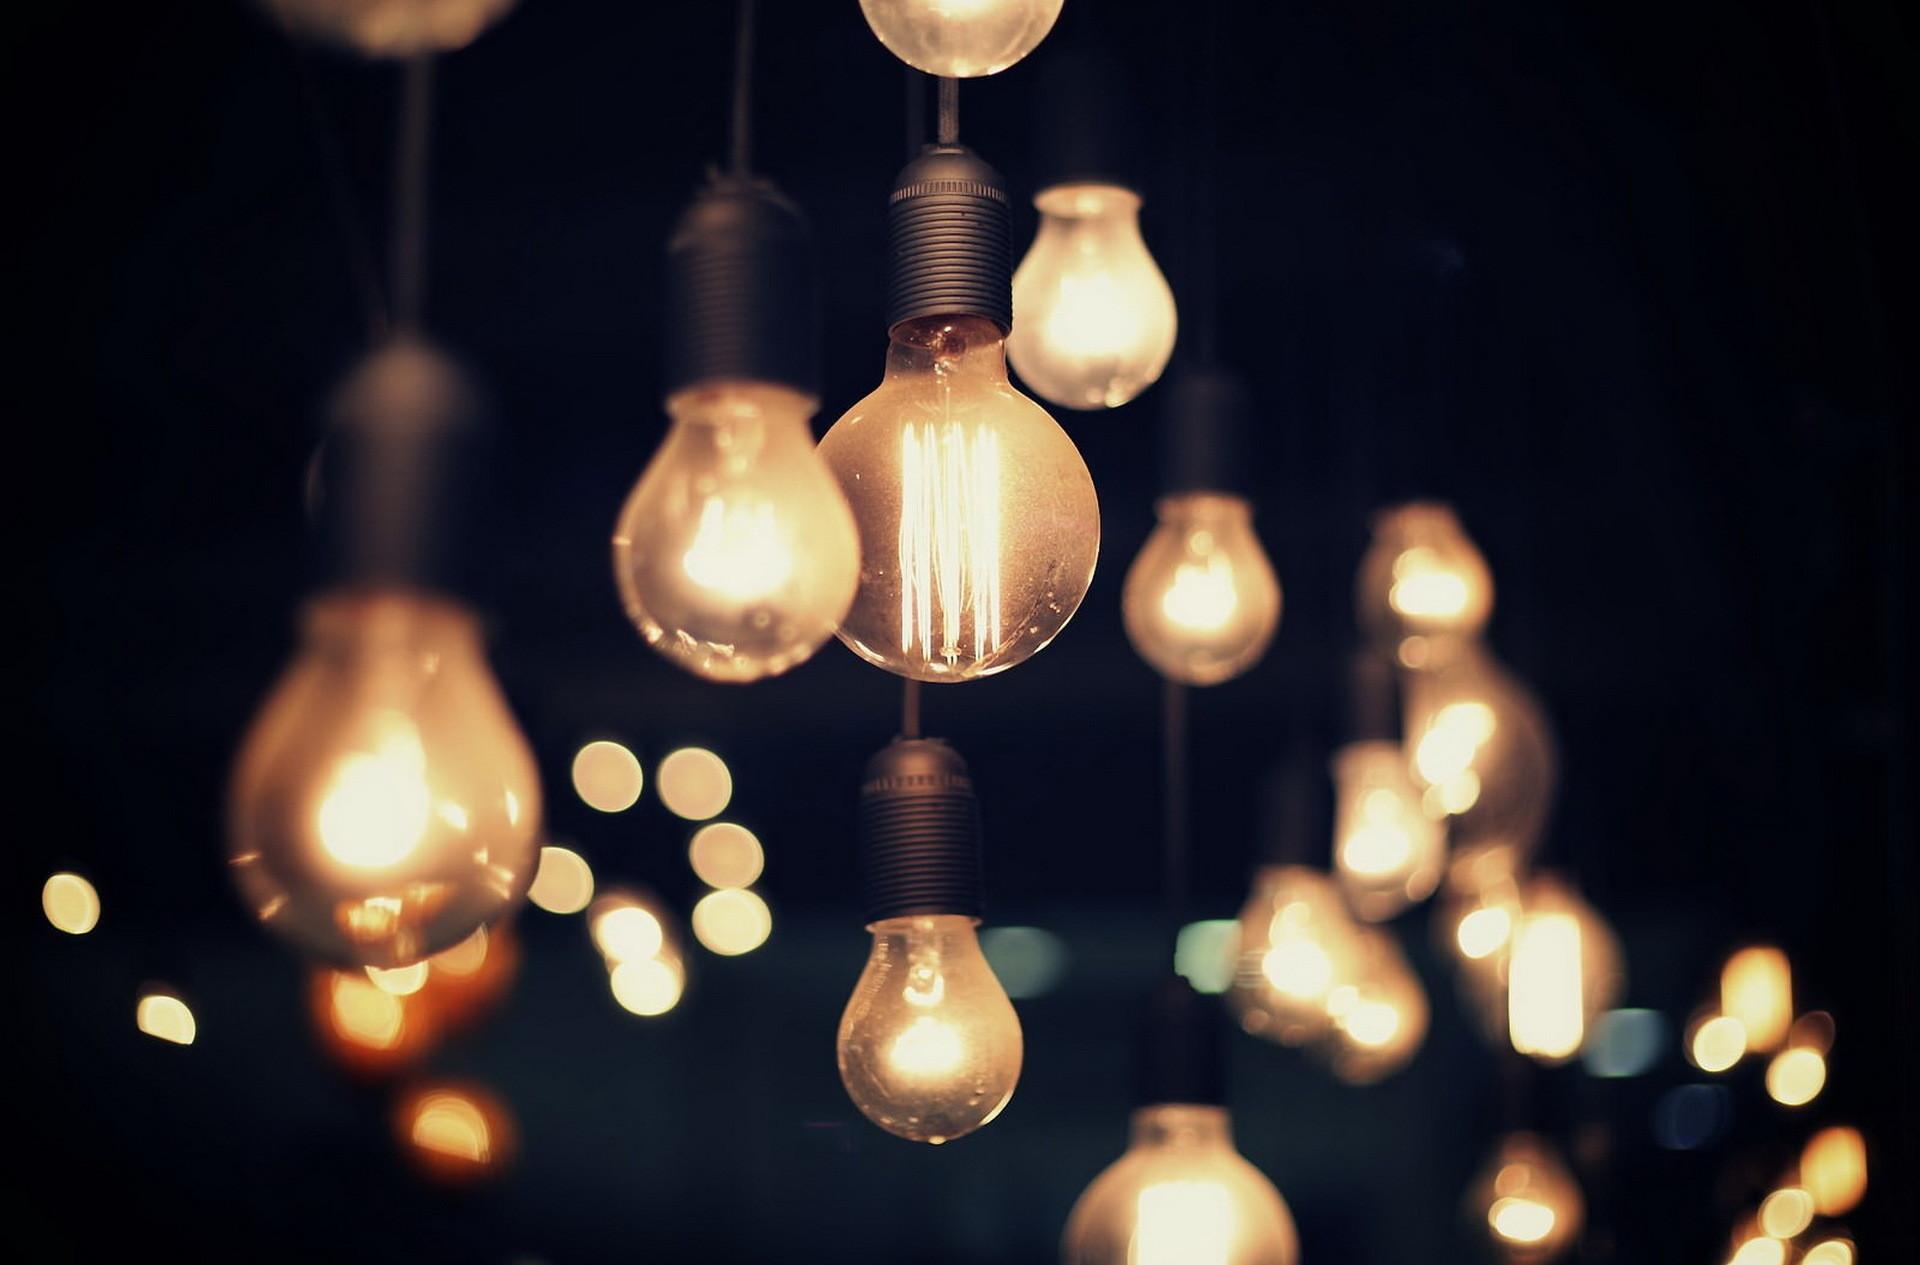 Light bulb hd wallpapers 81 images - Night light hd wallpaper ...